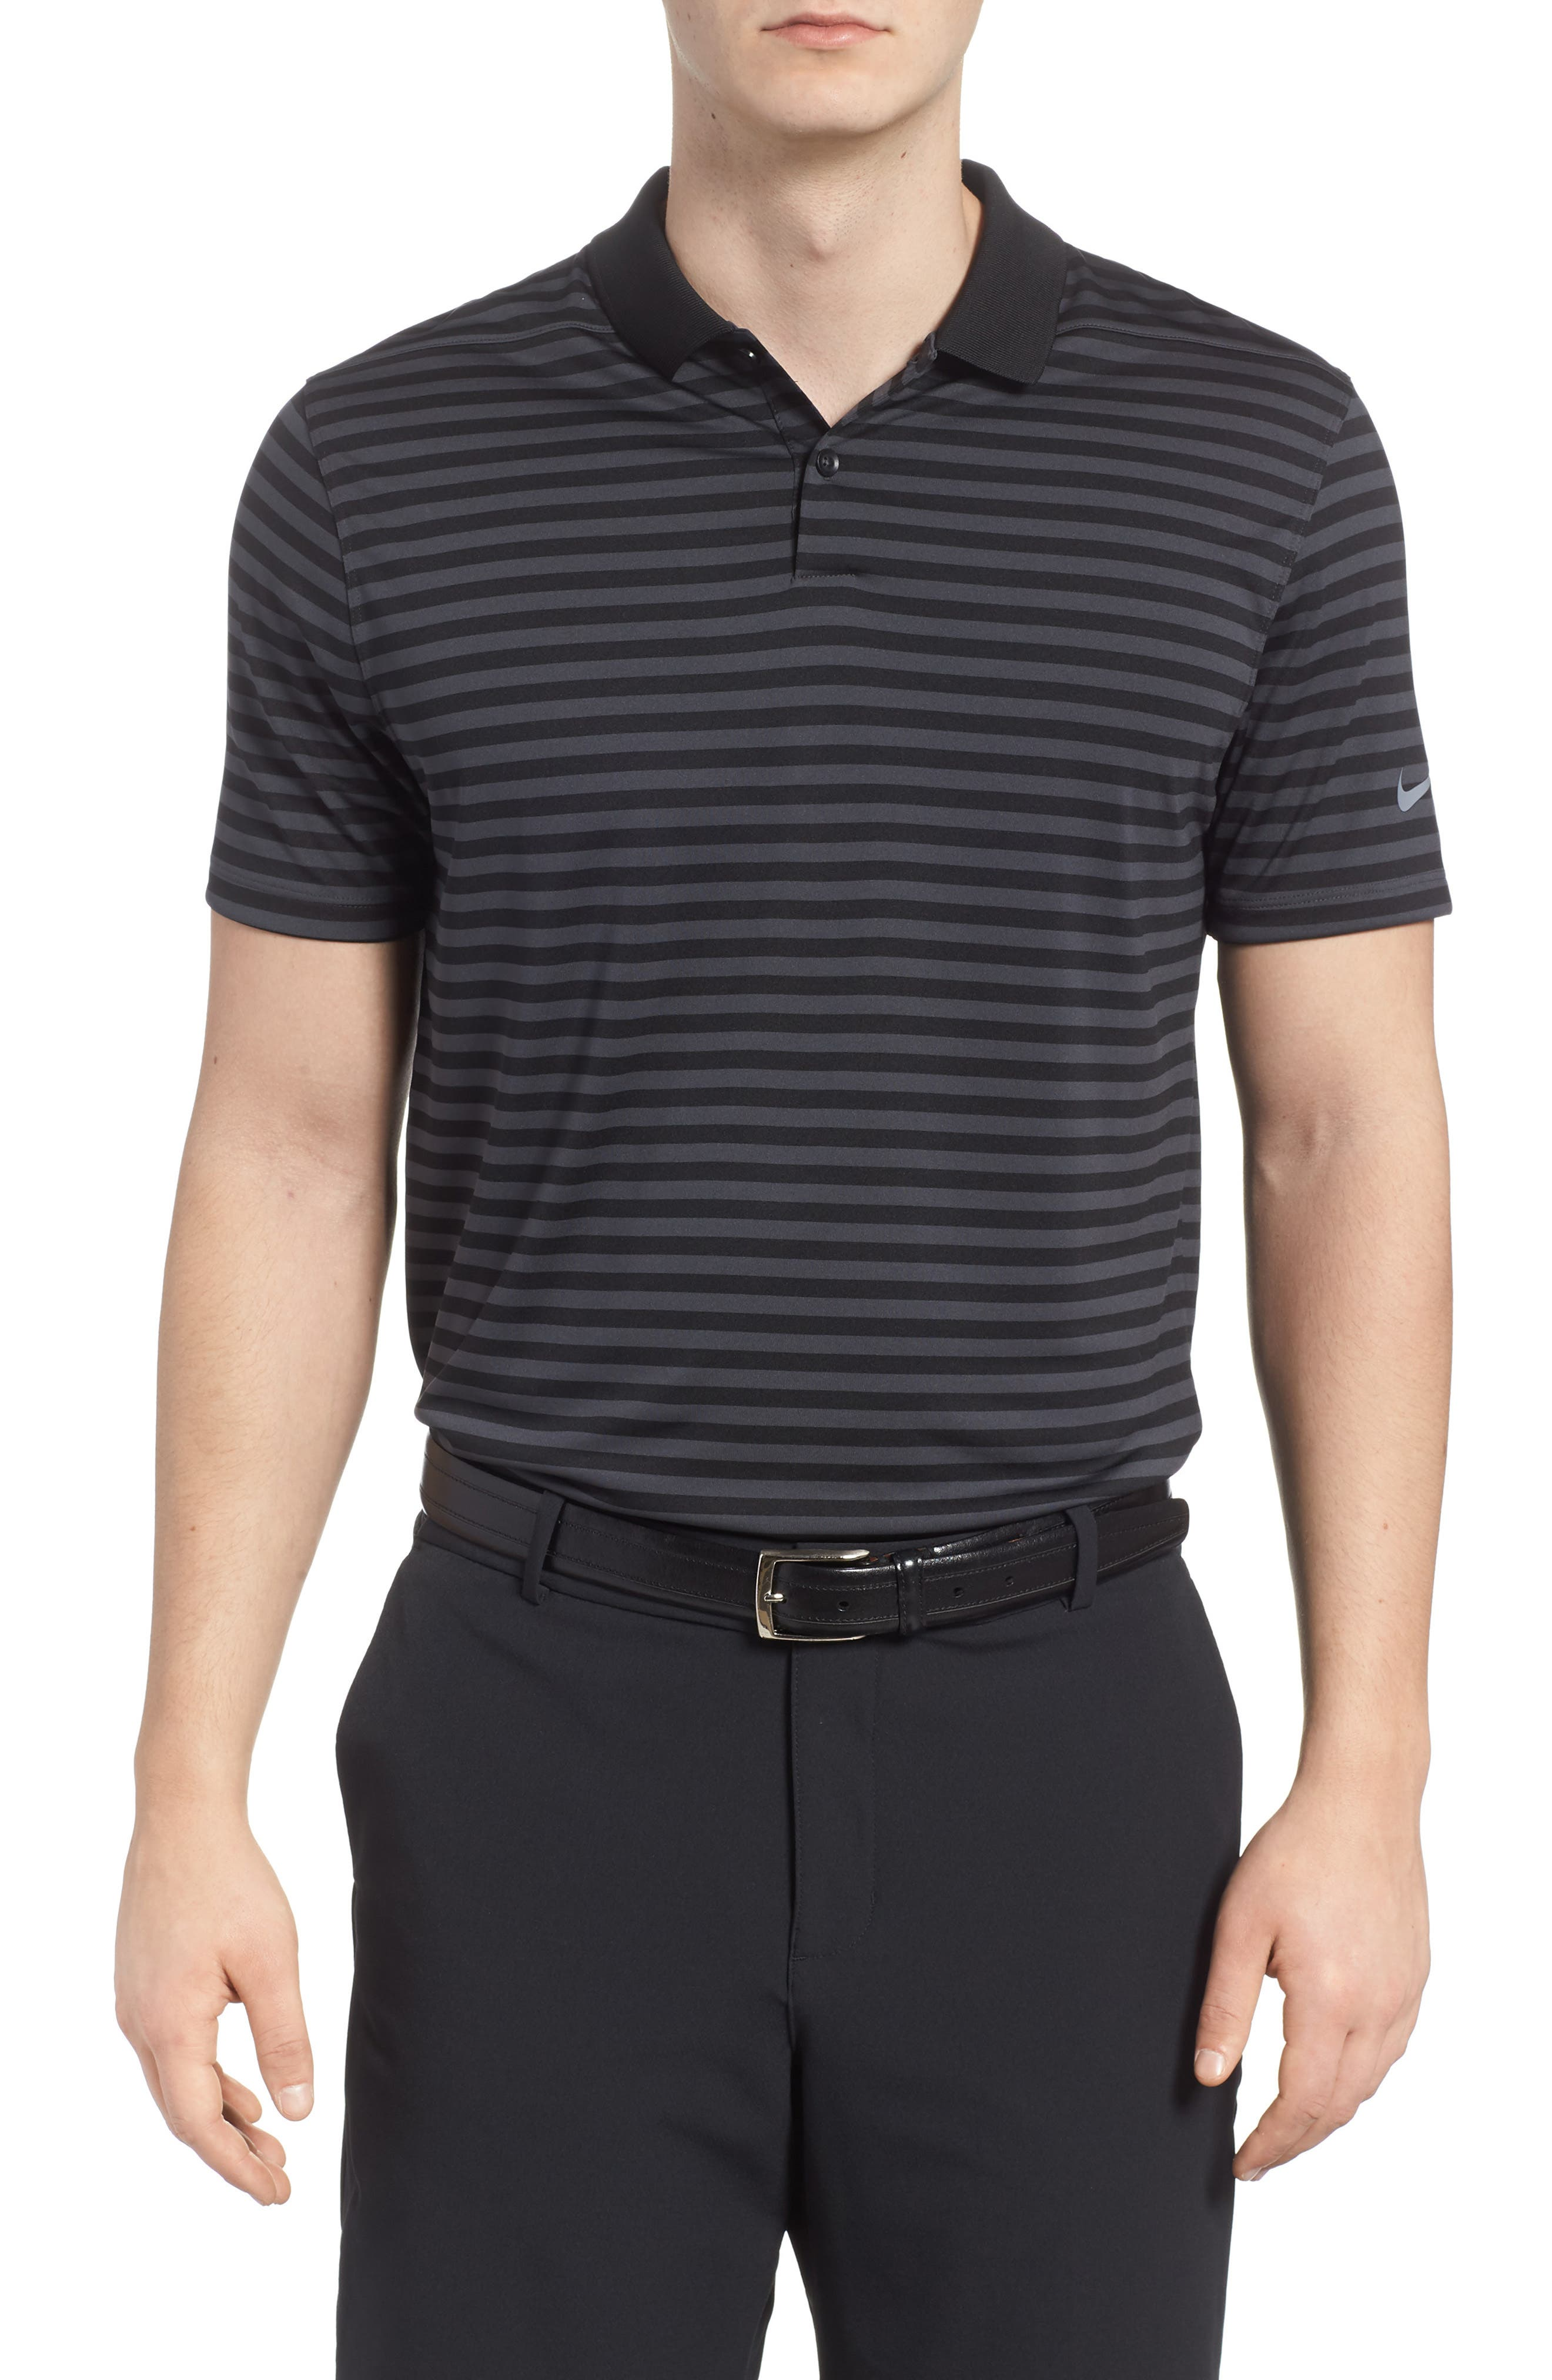 NIKE Dry Victory Stripe Golf Polo, Main, color, 010